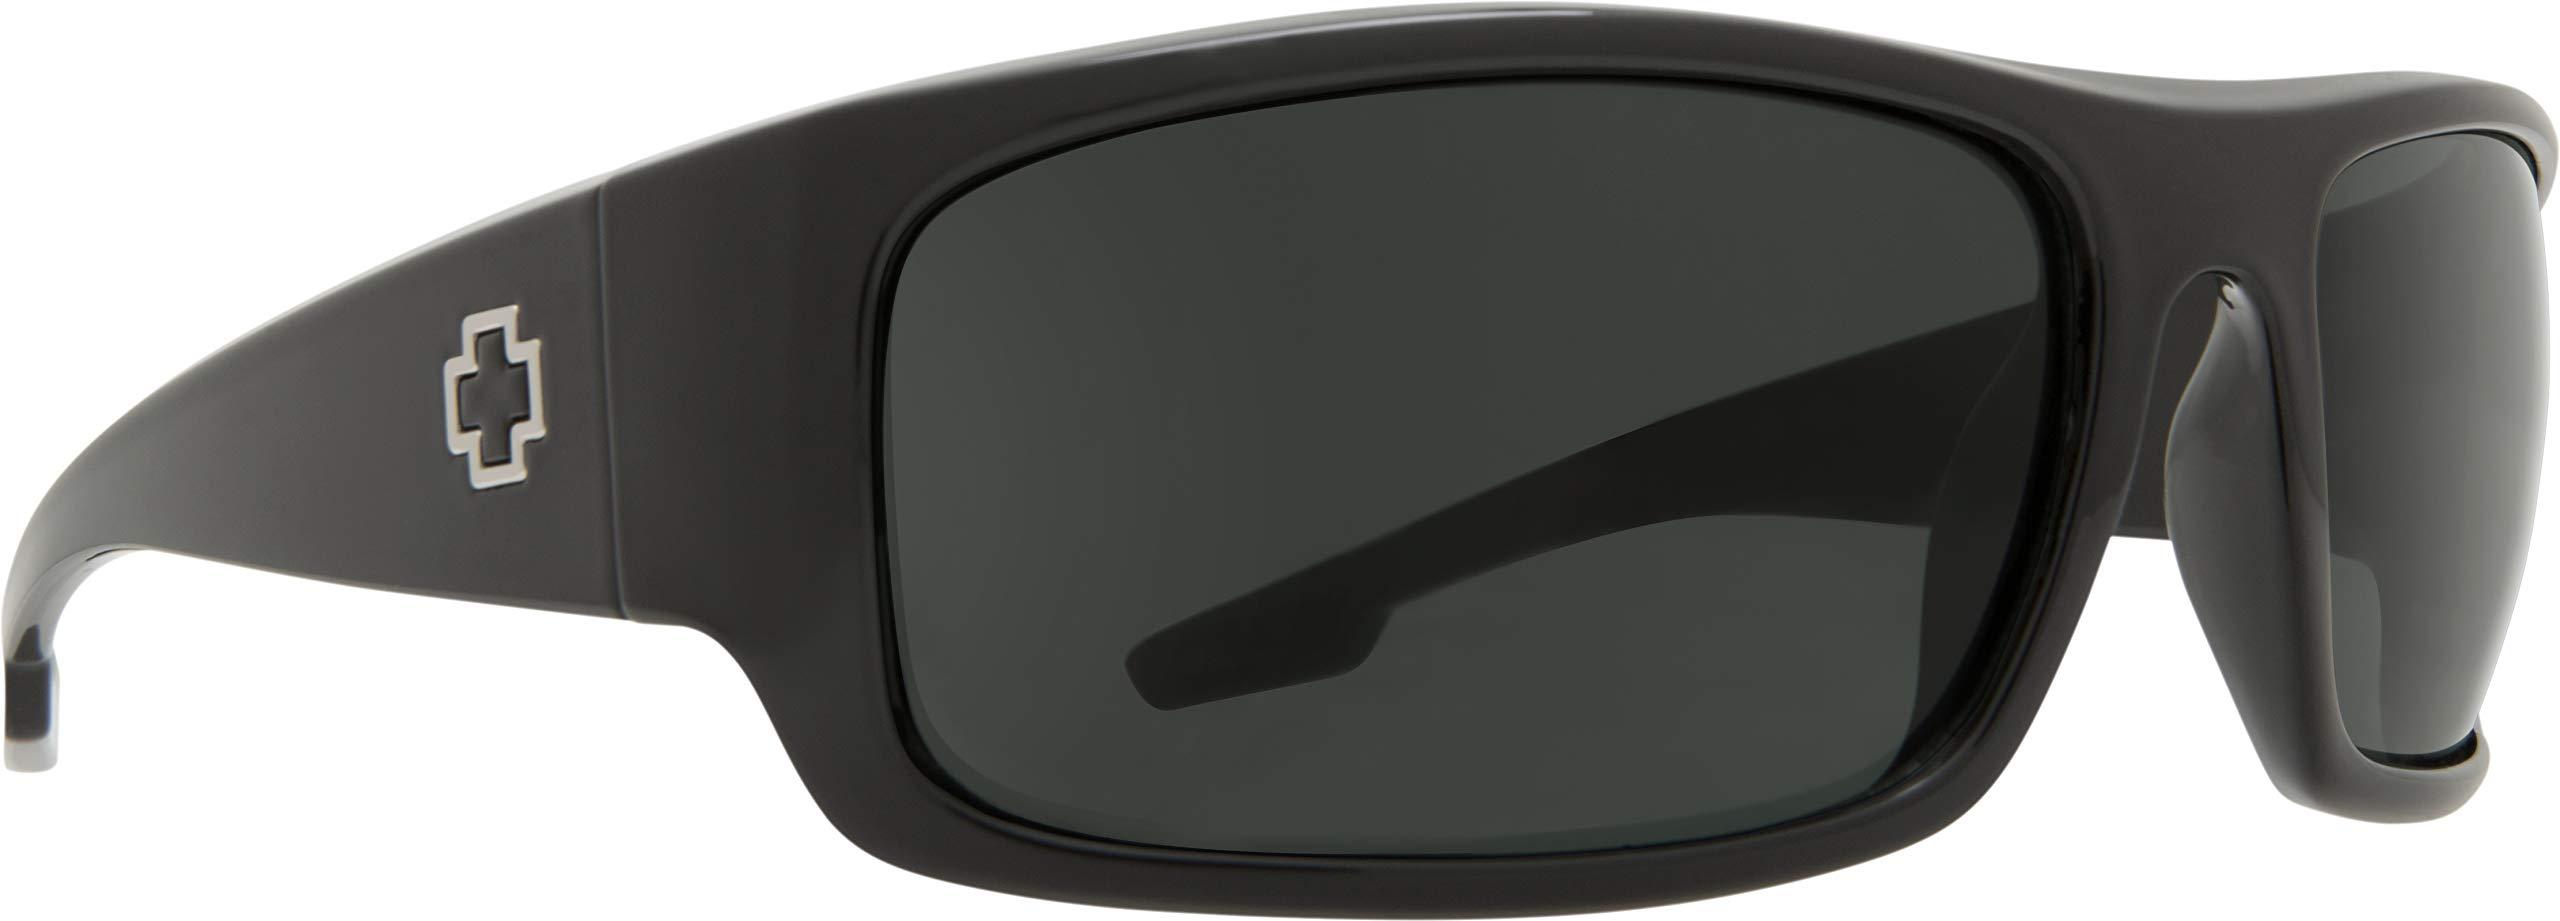 Piper Black - Gray Polarized